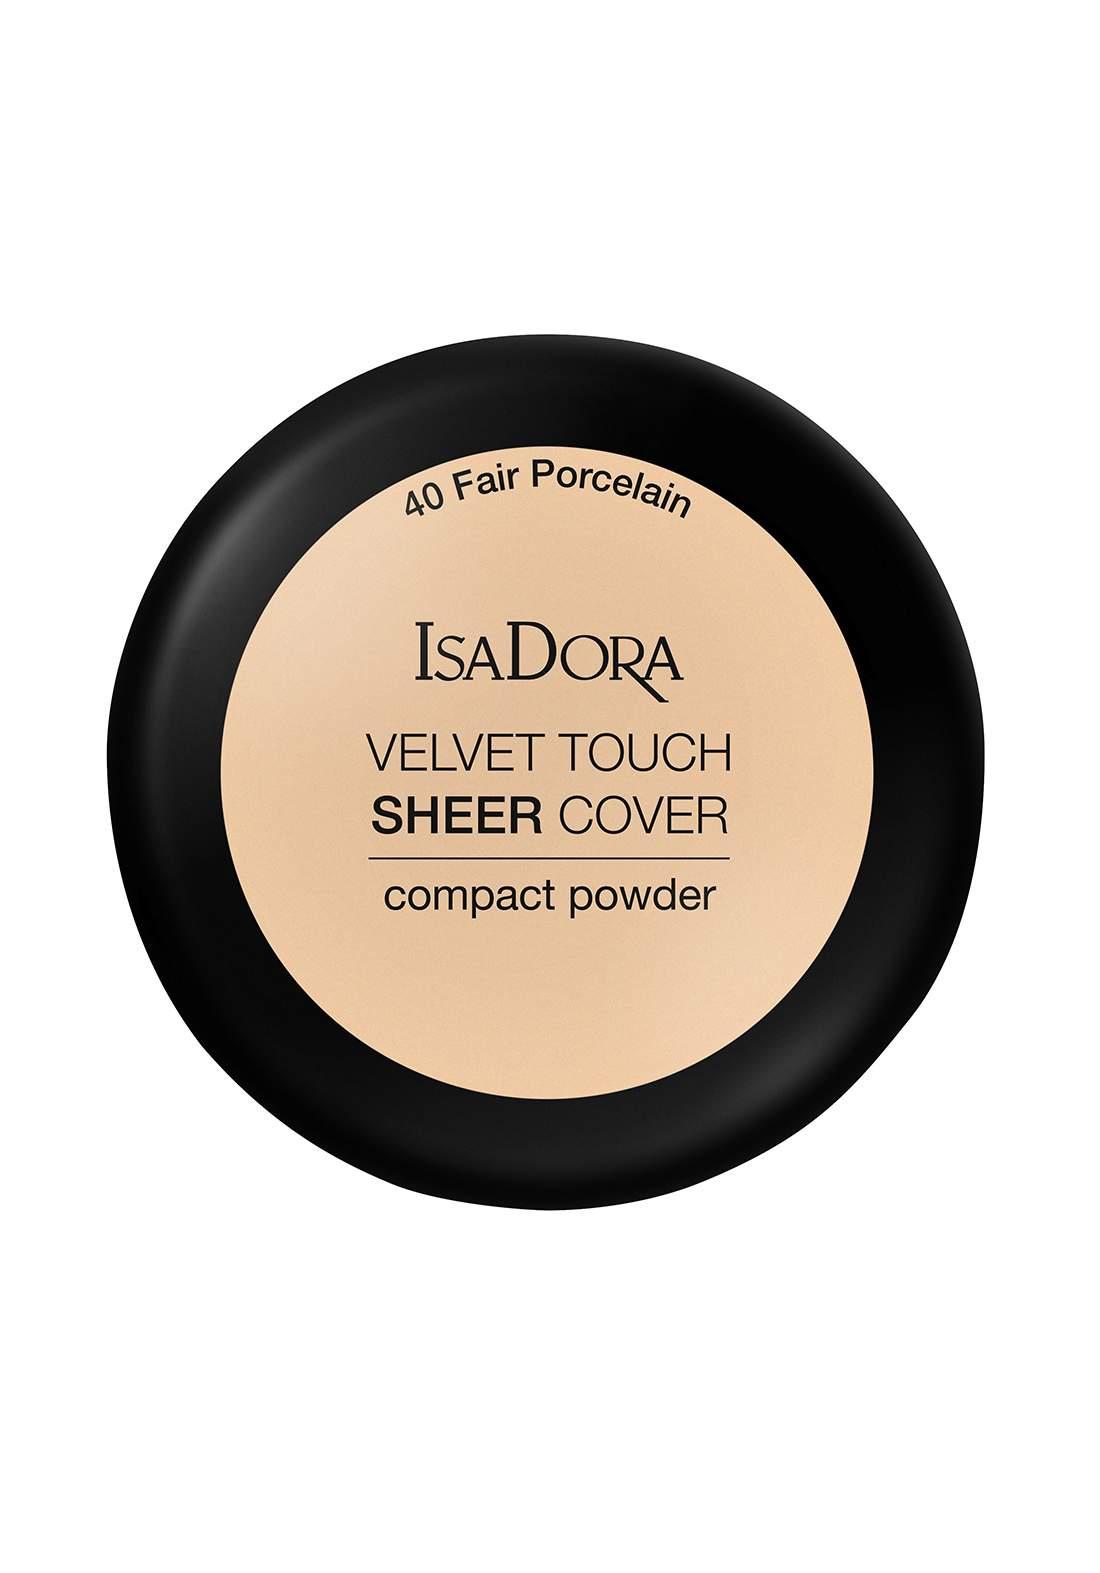 IsaDora 317107 Velvet Touch Sheer Cover Compact Powder Fair Porcelain NO.40 باودر